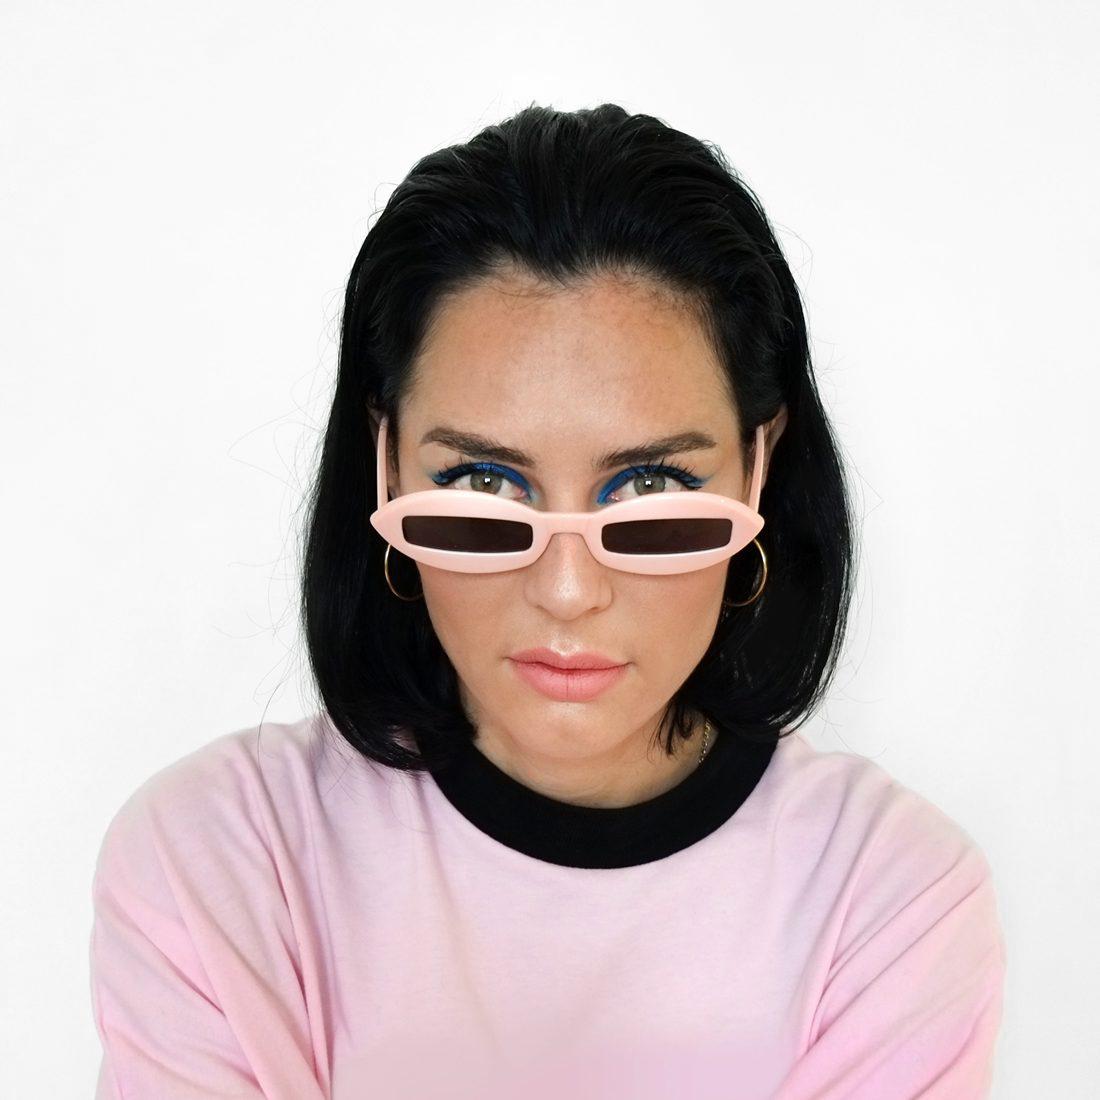 glassespink-1100×1100.